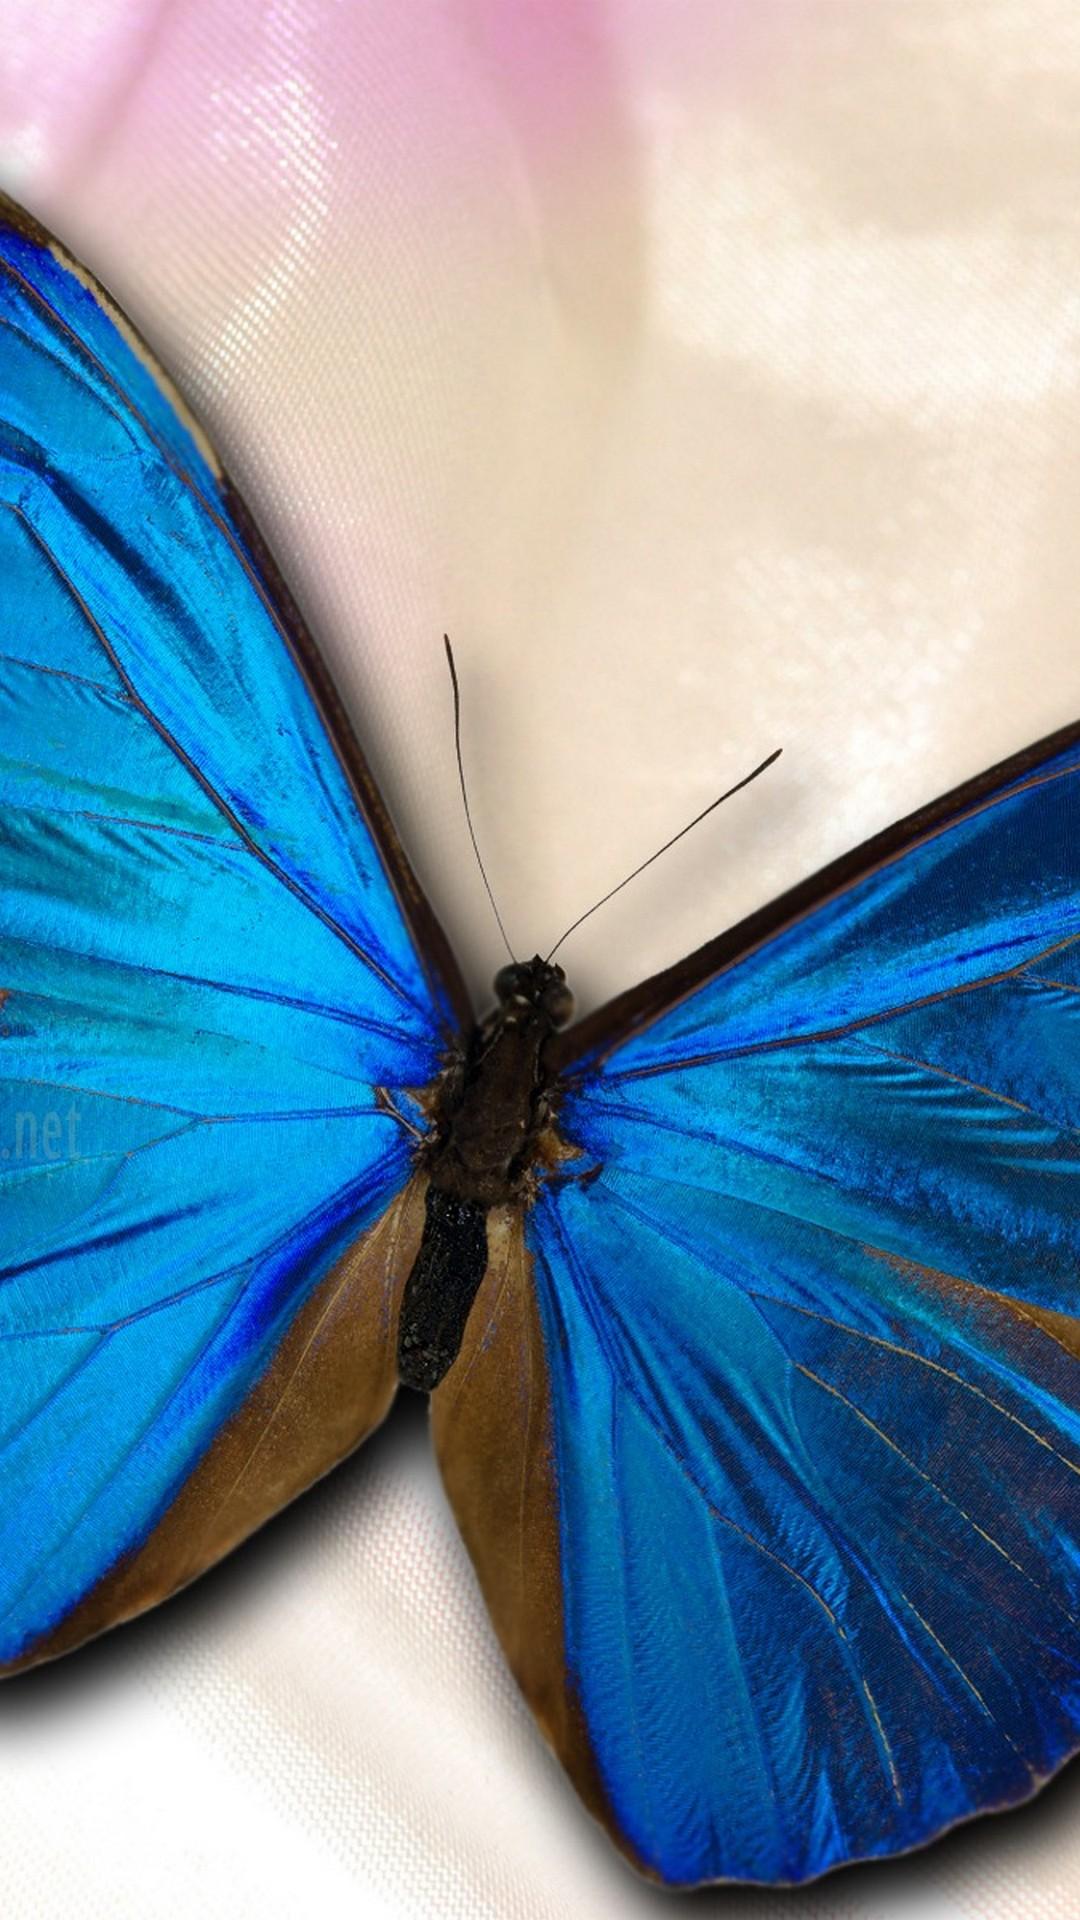 Silver Blue Butterfly Backgrounds Wallpaper